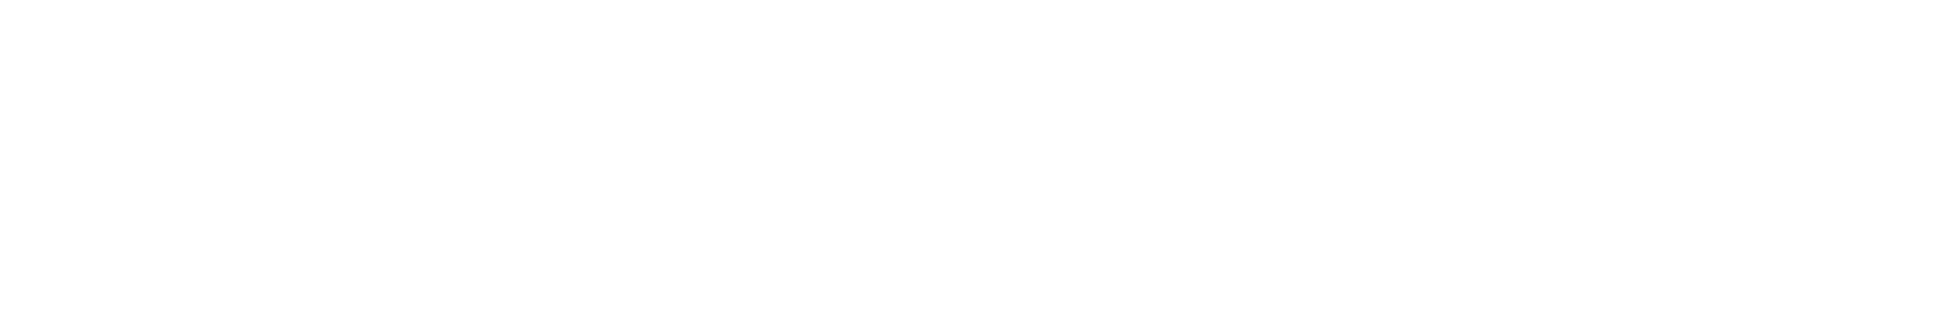 Cotelo & Co